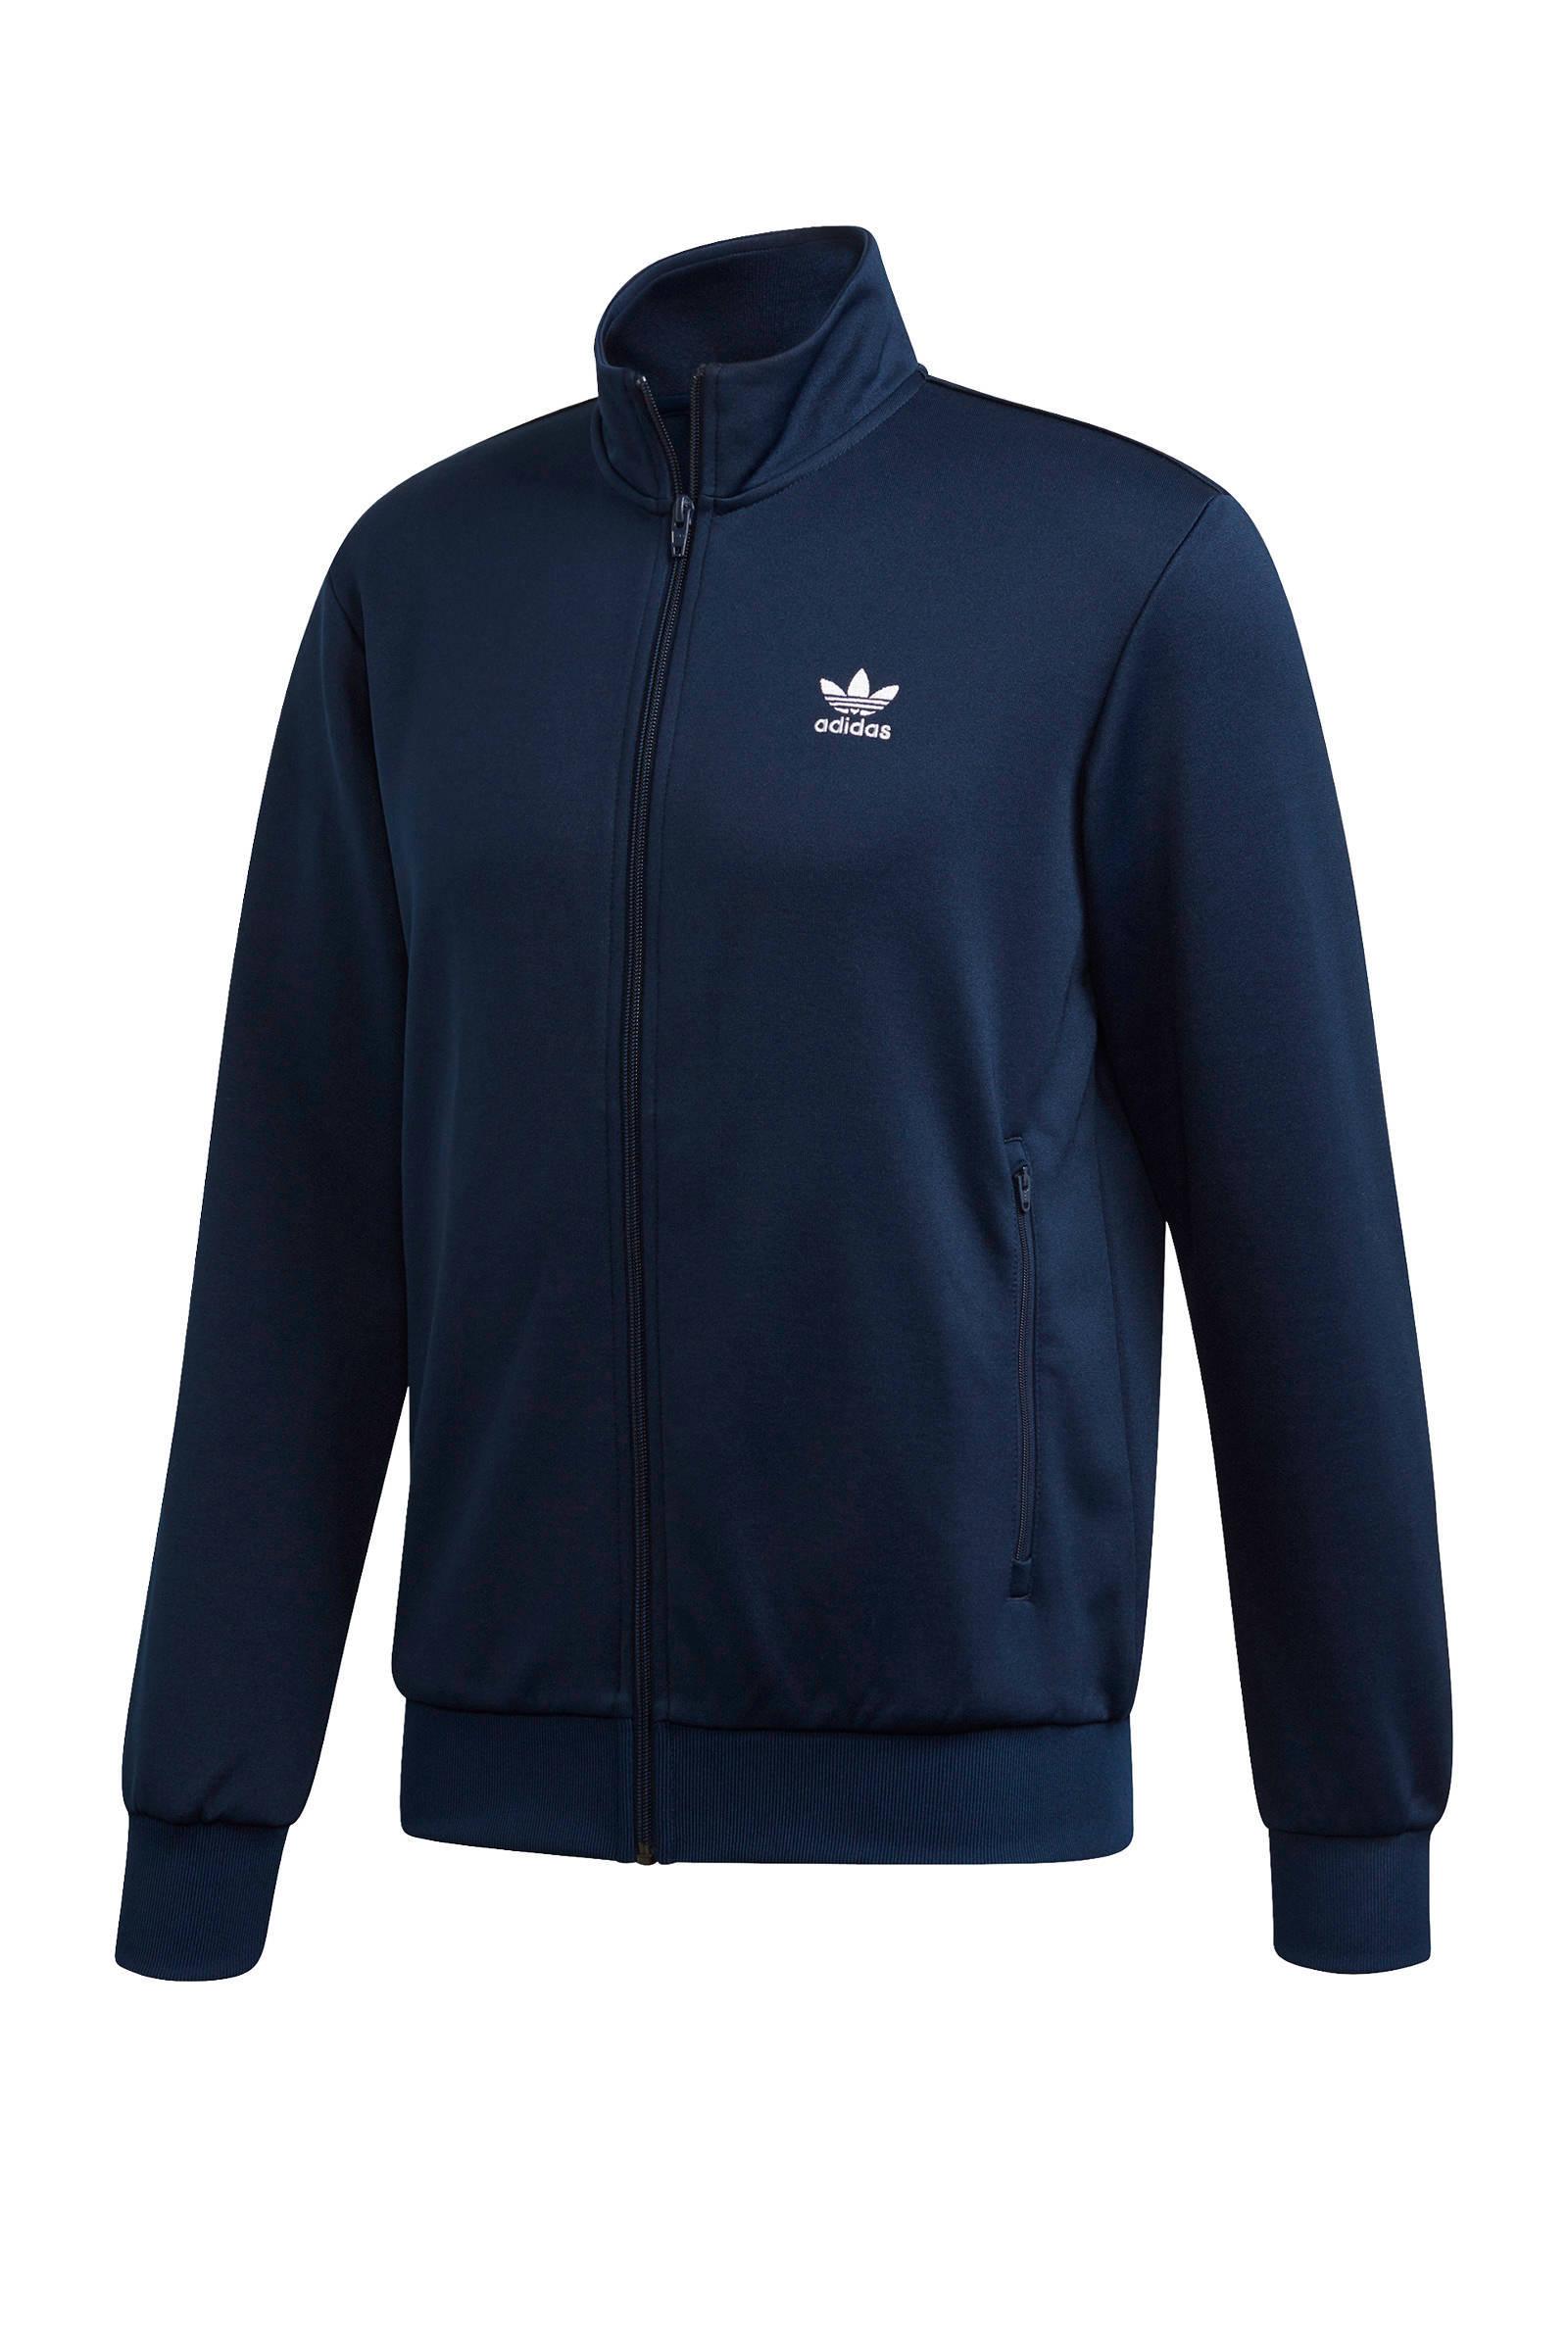 adidas Originals vest lichtblauw | wehkamp